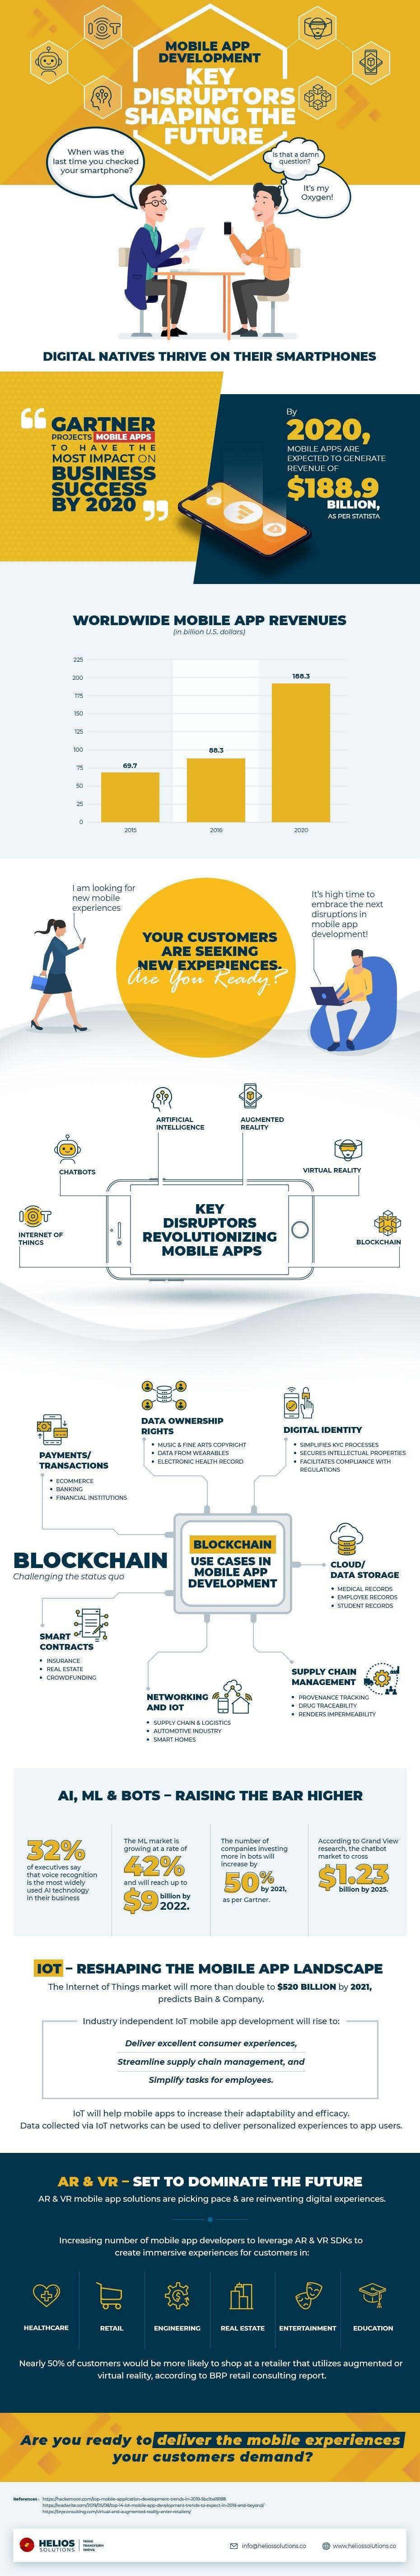 Mobile App Development Key Disruptors Shaping The Future #infographic